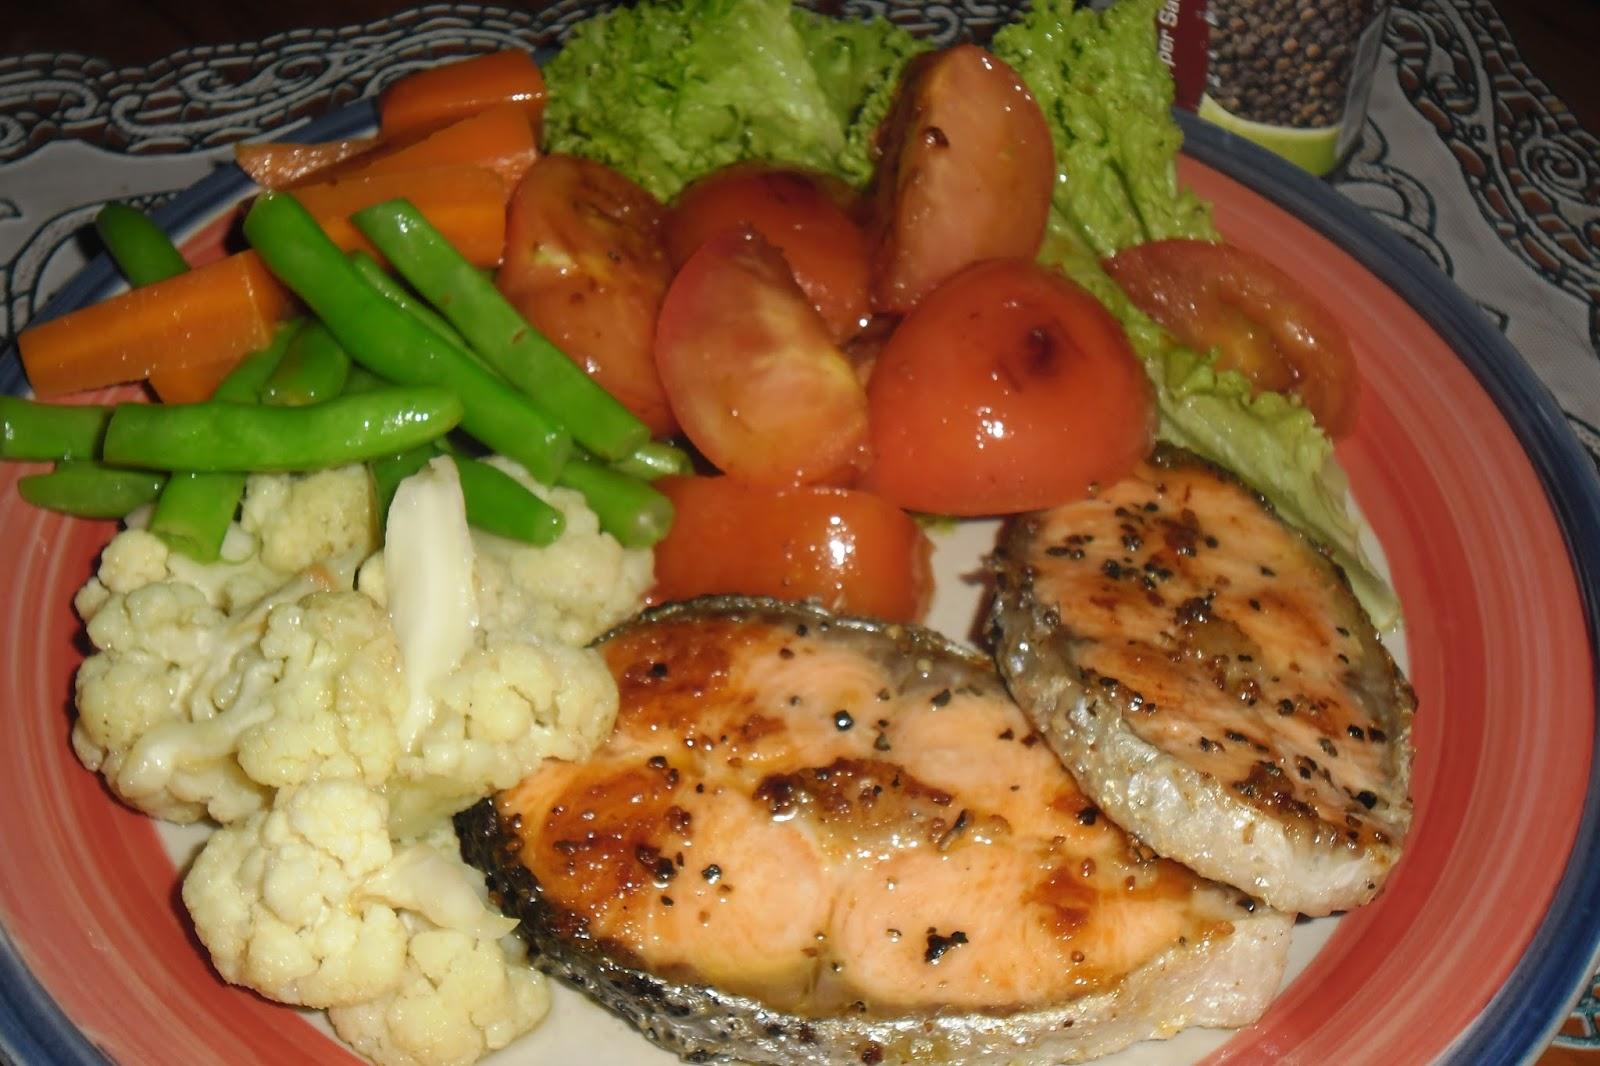 Resepi Ikan Salmon Grill Untuk Bayi Brad Erva Doce Info